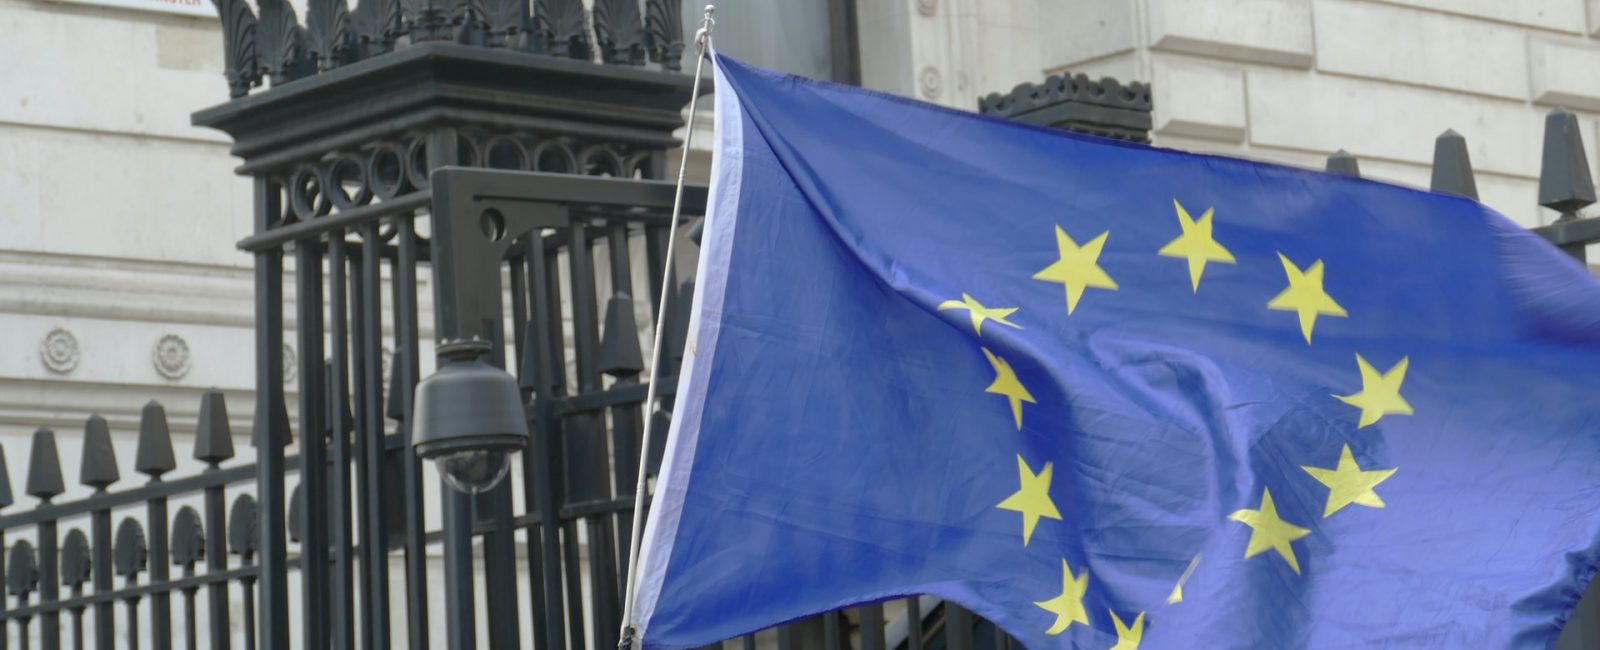 Populism, Leadership and Broken Campaign Pledges